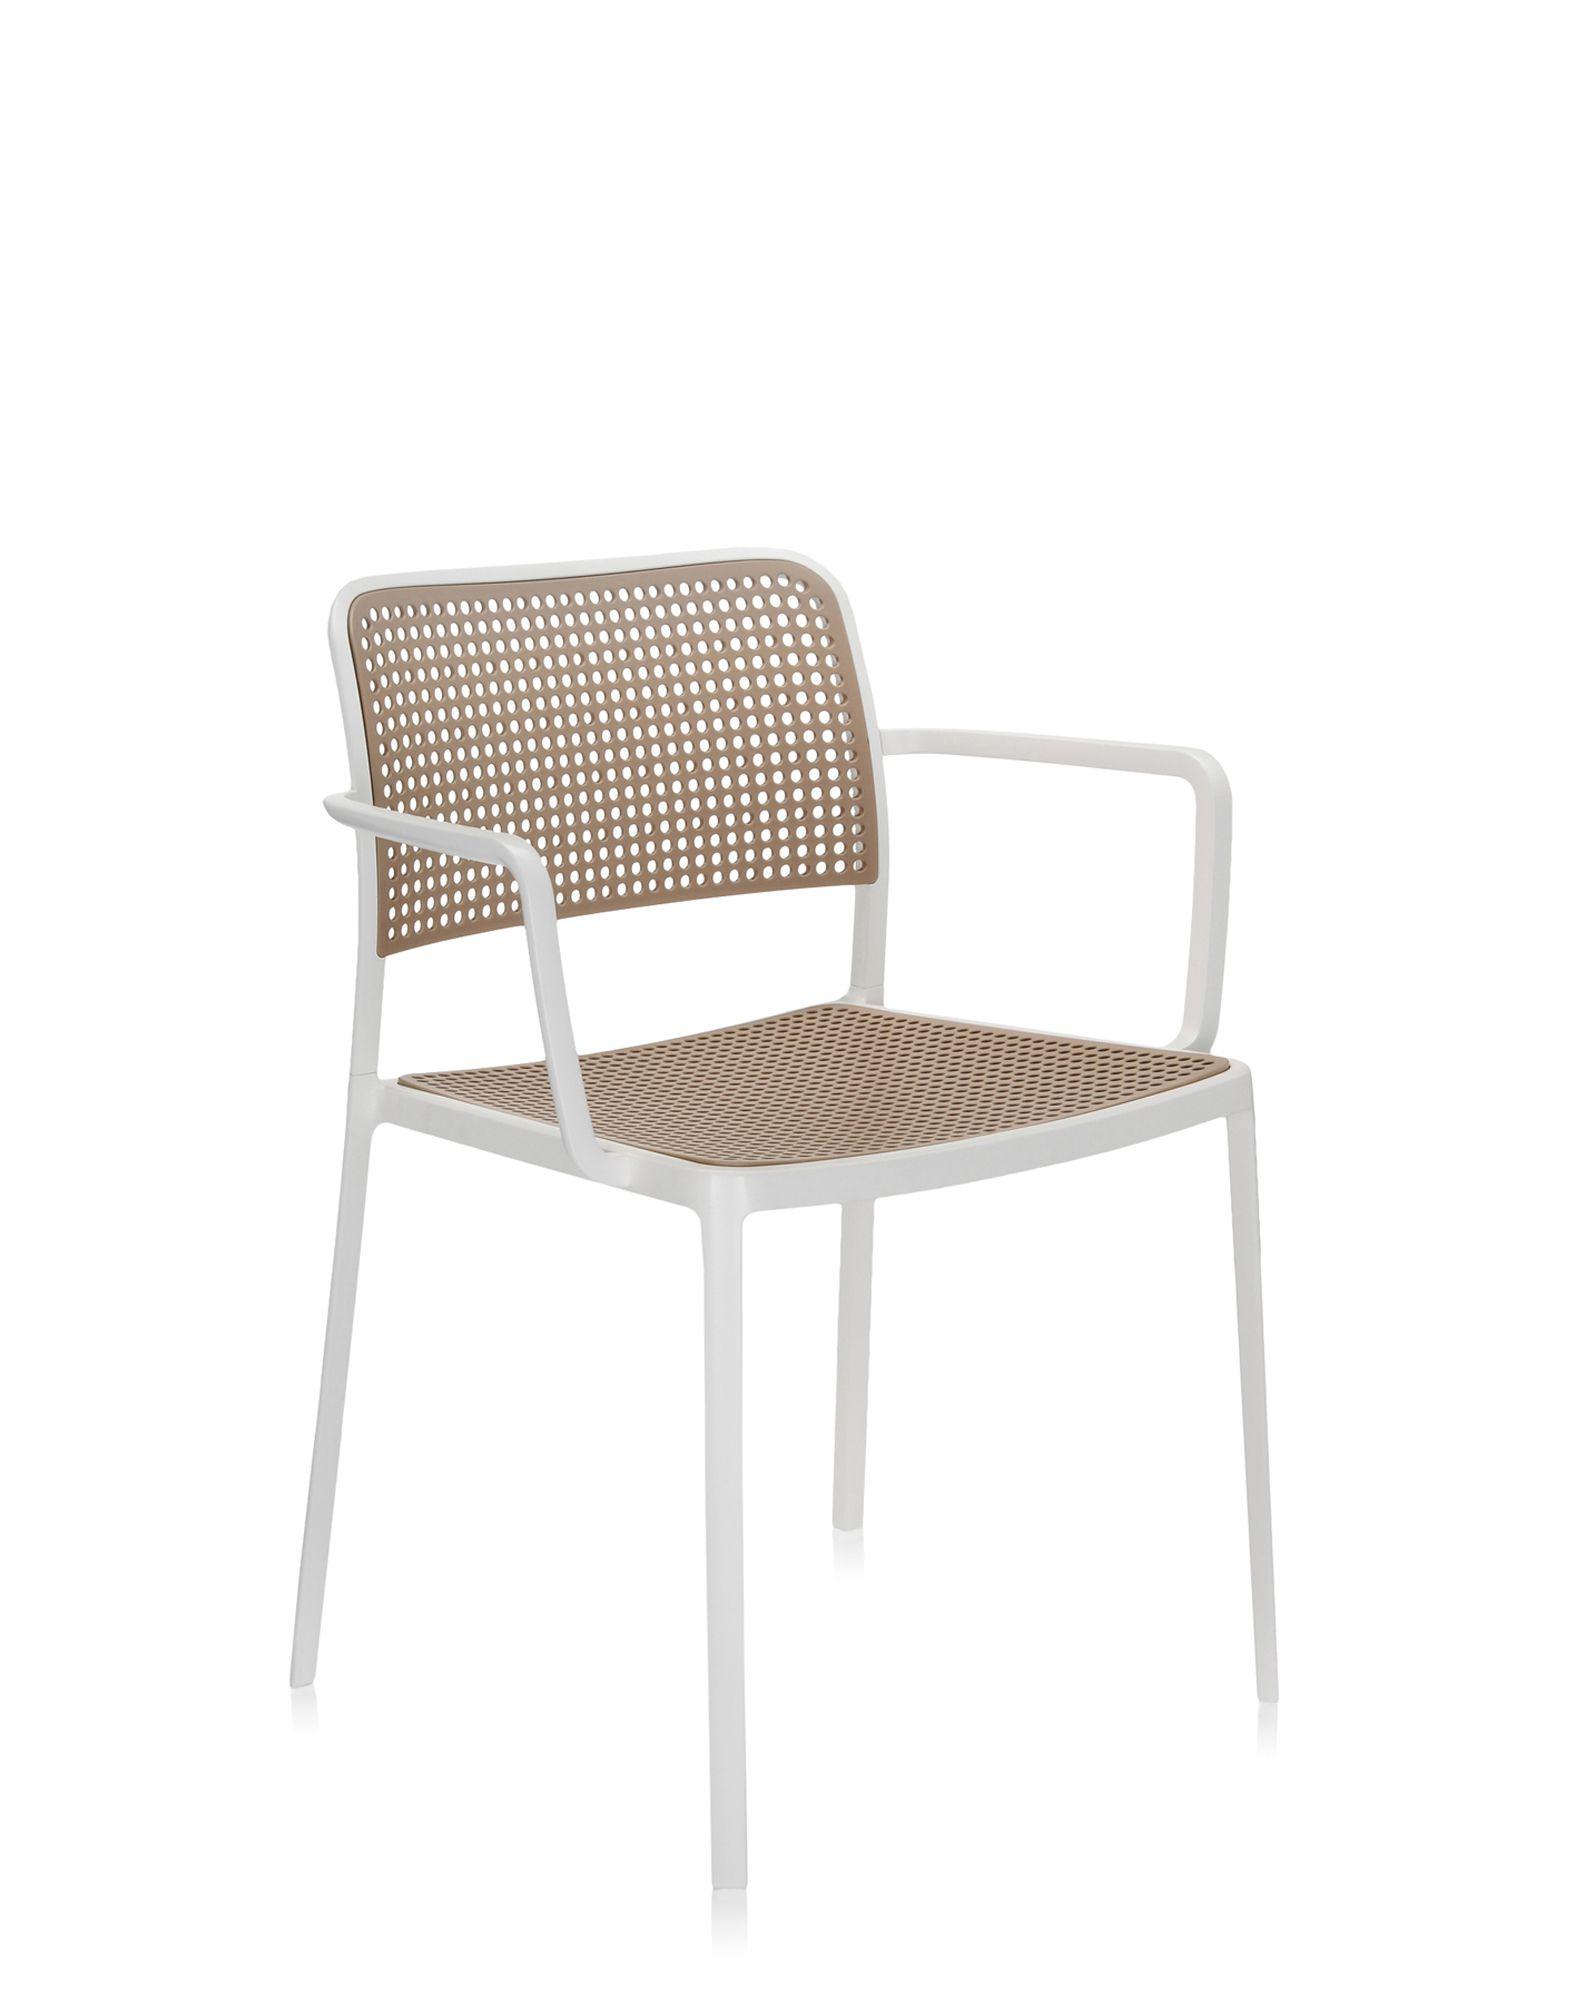 Kartell audrey sabbia alluminio verniciato bianco sedie for Sedie alluminio design